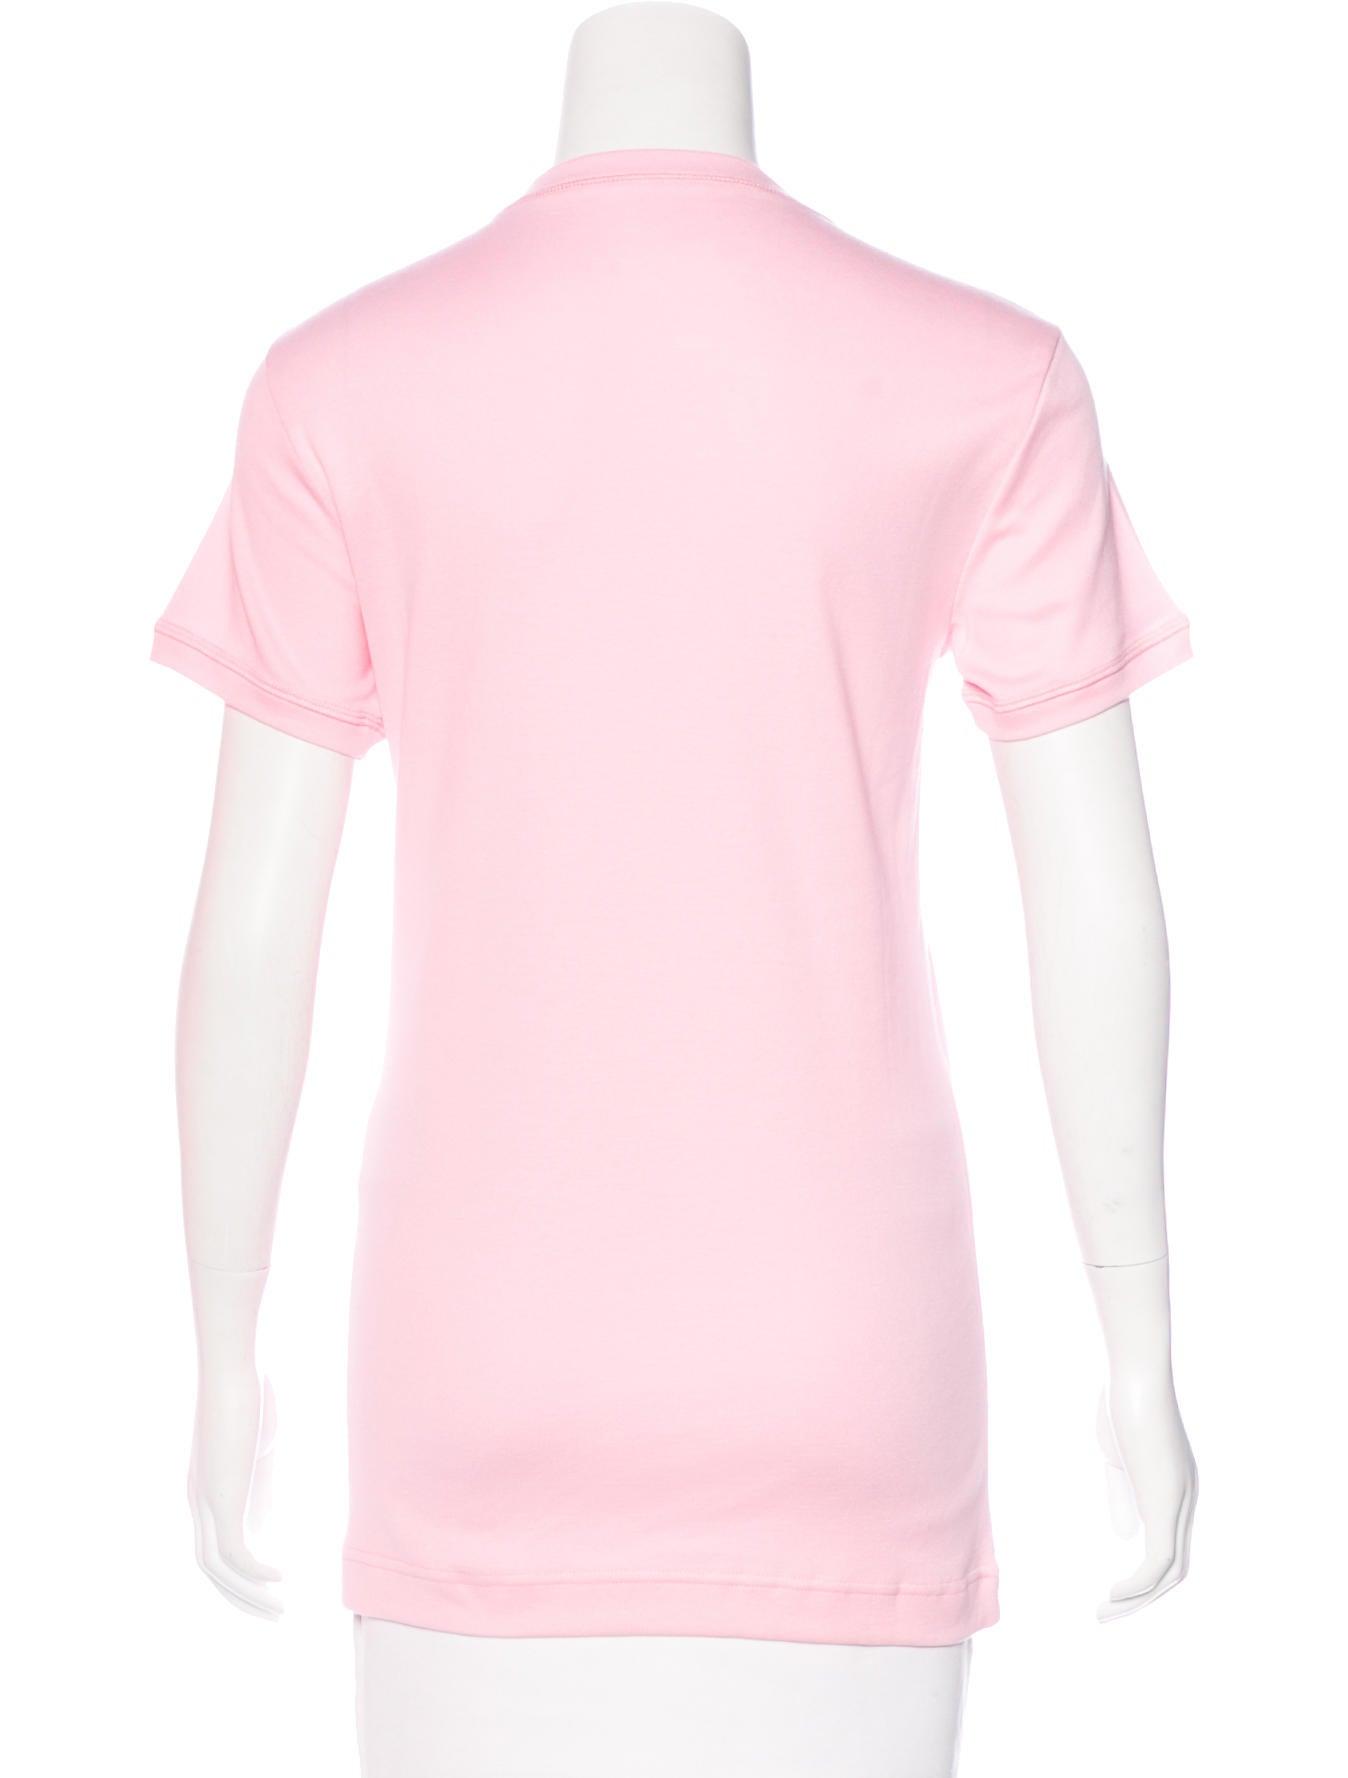 Dolce gabbana short sleeve printed t shirt clothing for Dolce gabbana t shirt women